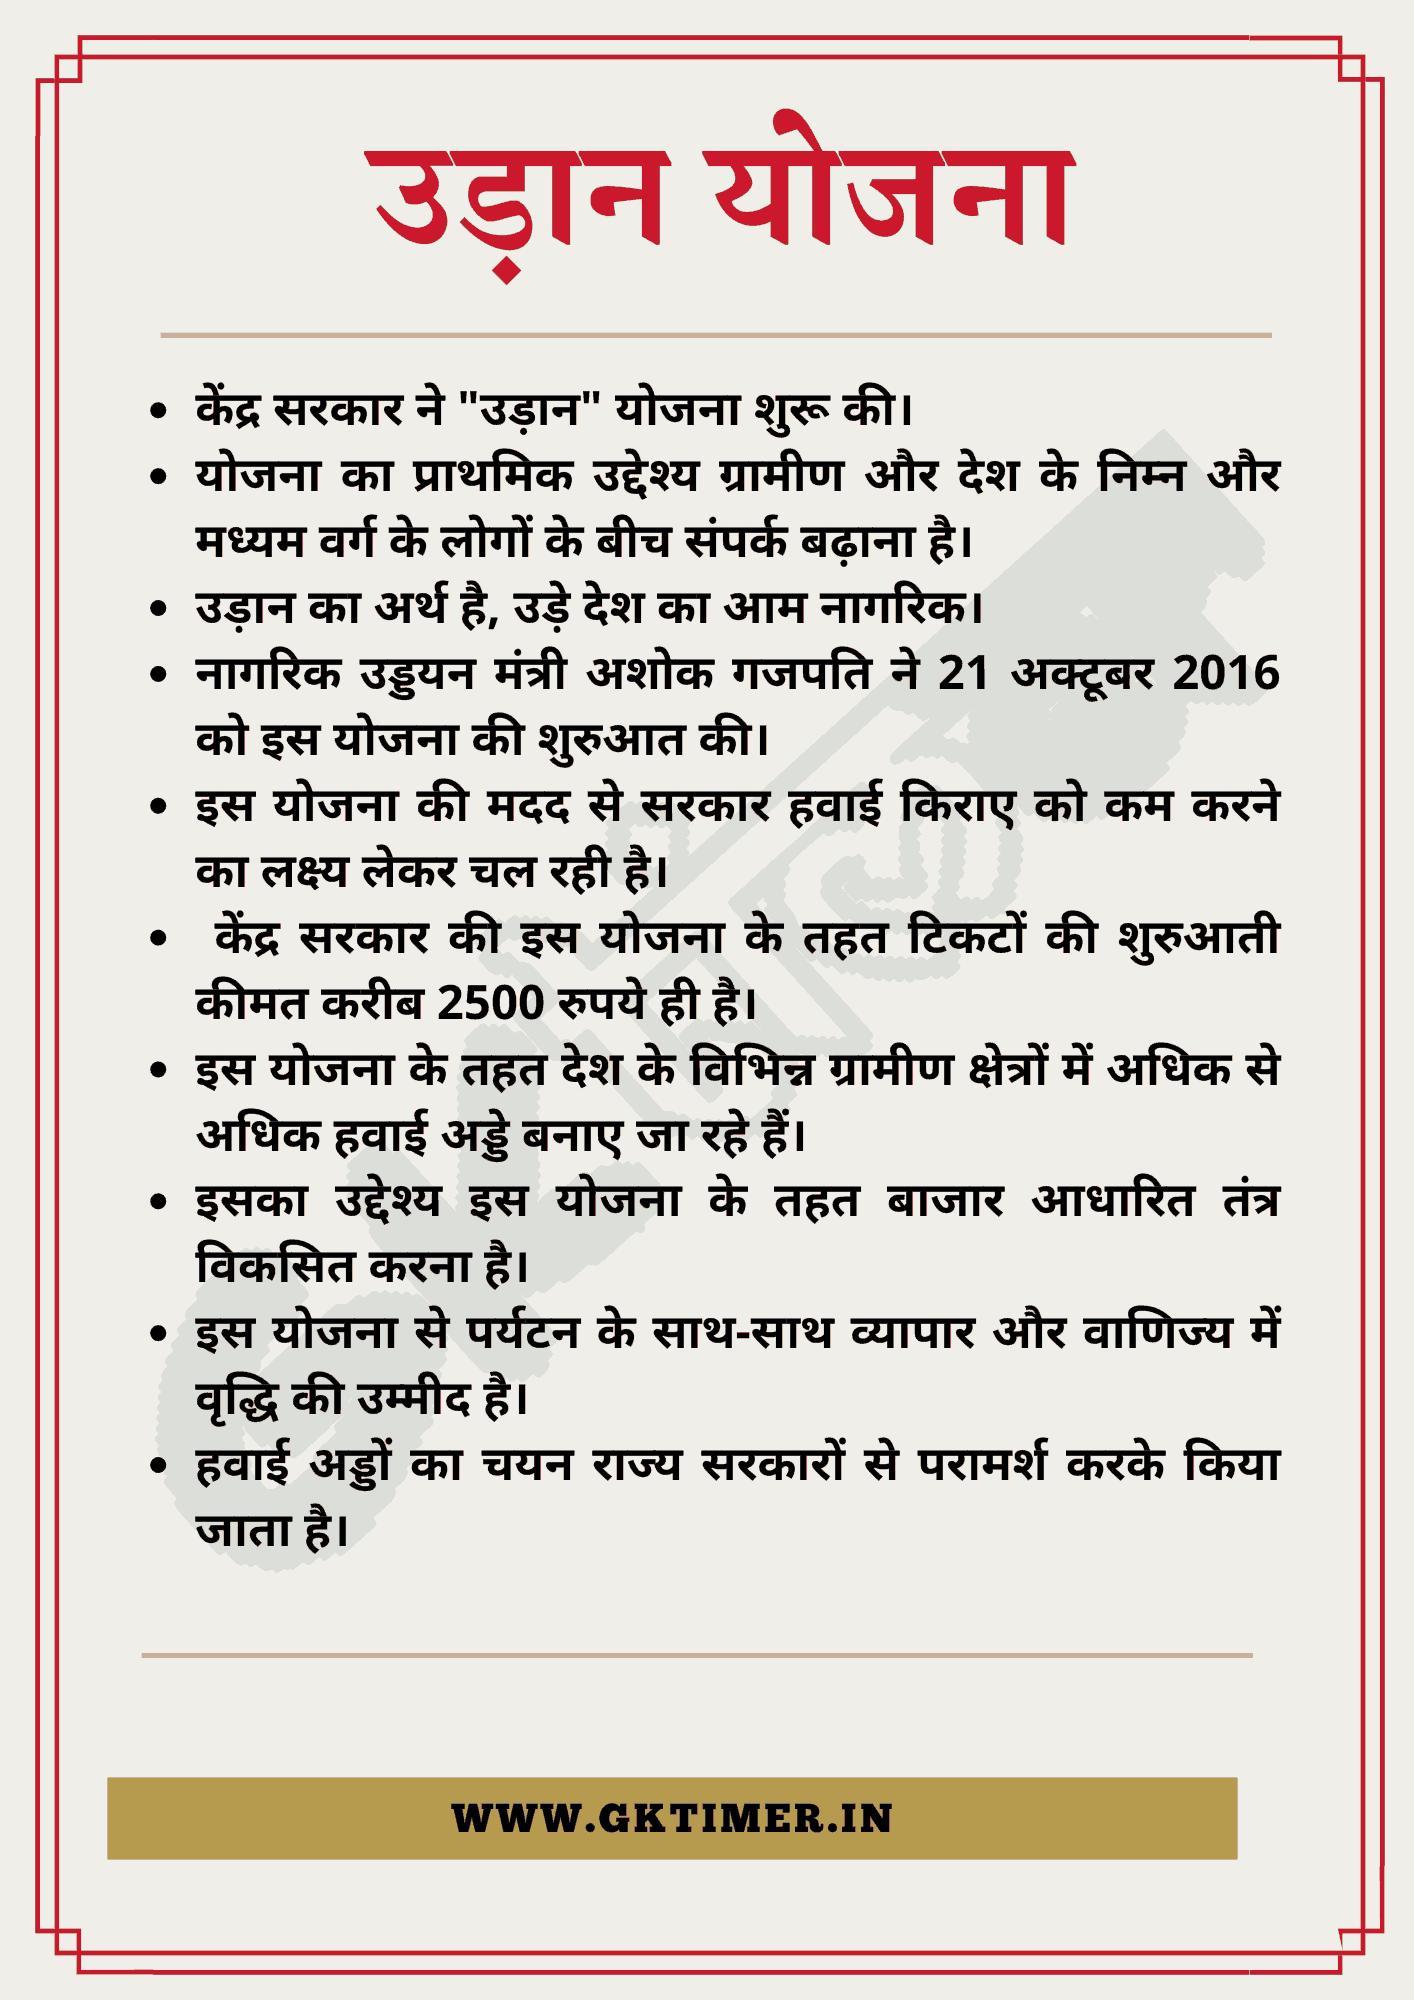 उड़ान योजना पर निबंध | Essay on Udan Scheme in Hindi | 10 Lines on Udan Scheme in Hindi